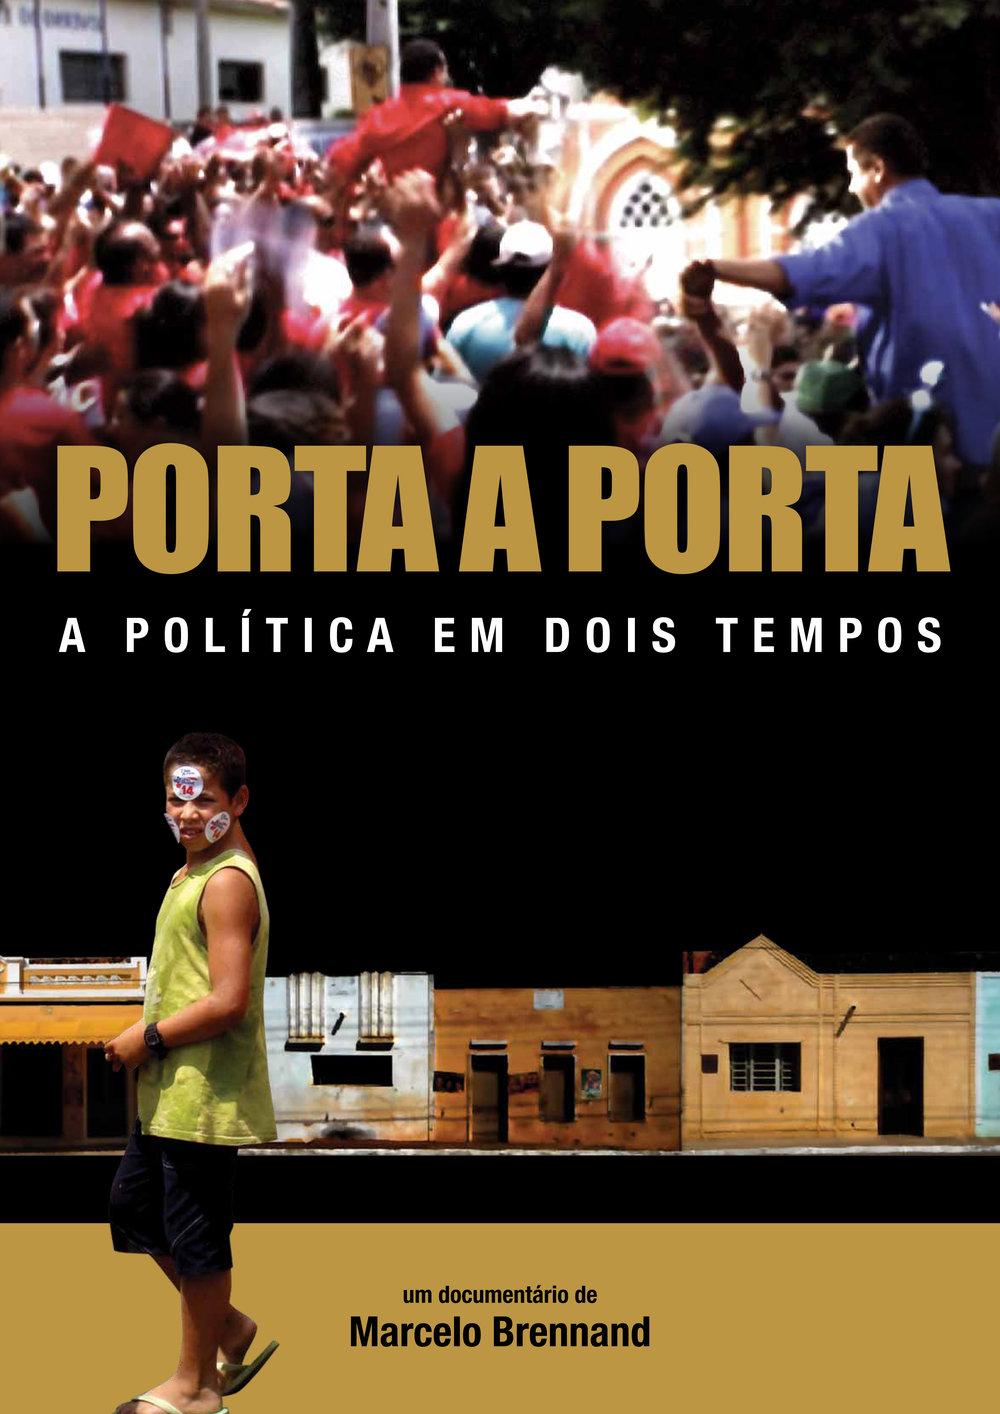 64_PortaaPorta.jpg